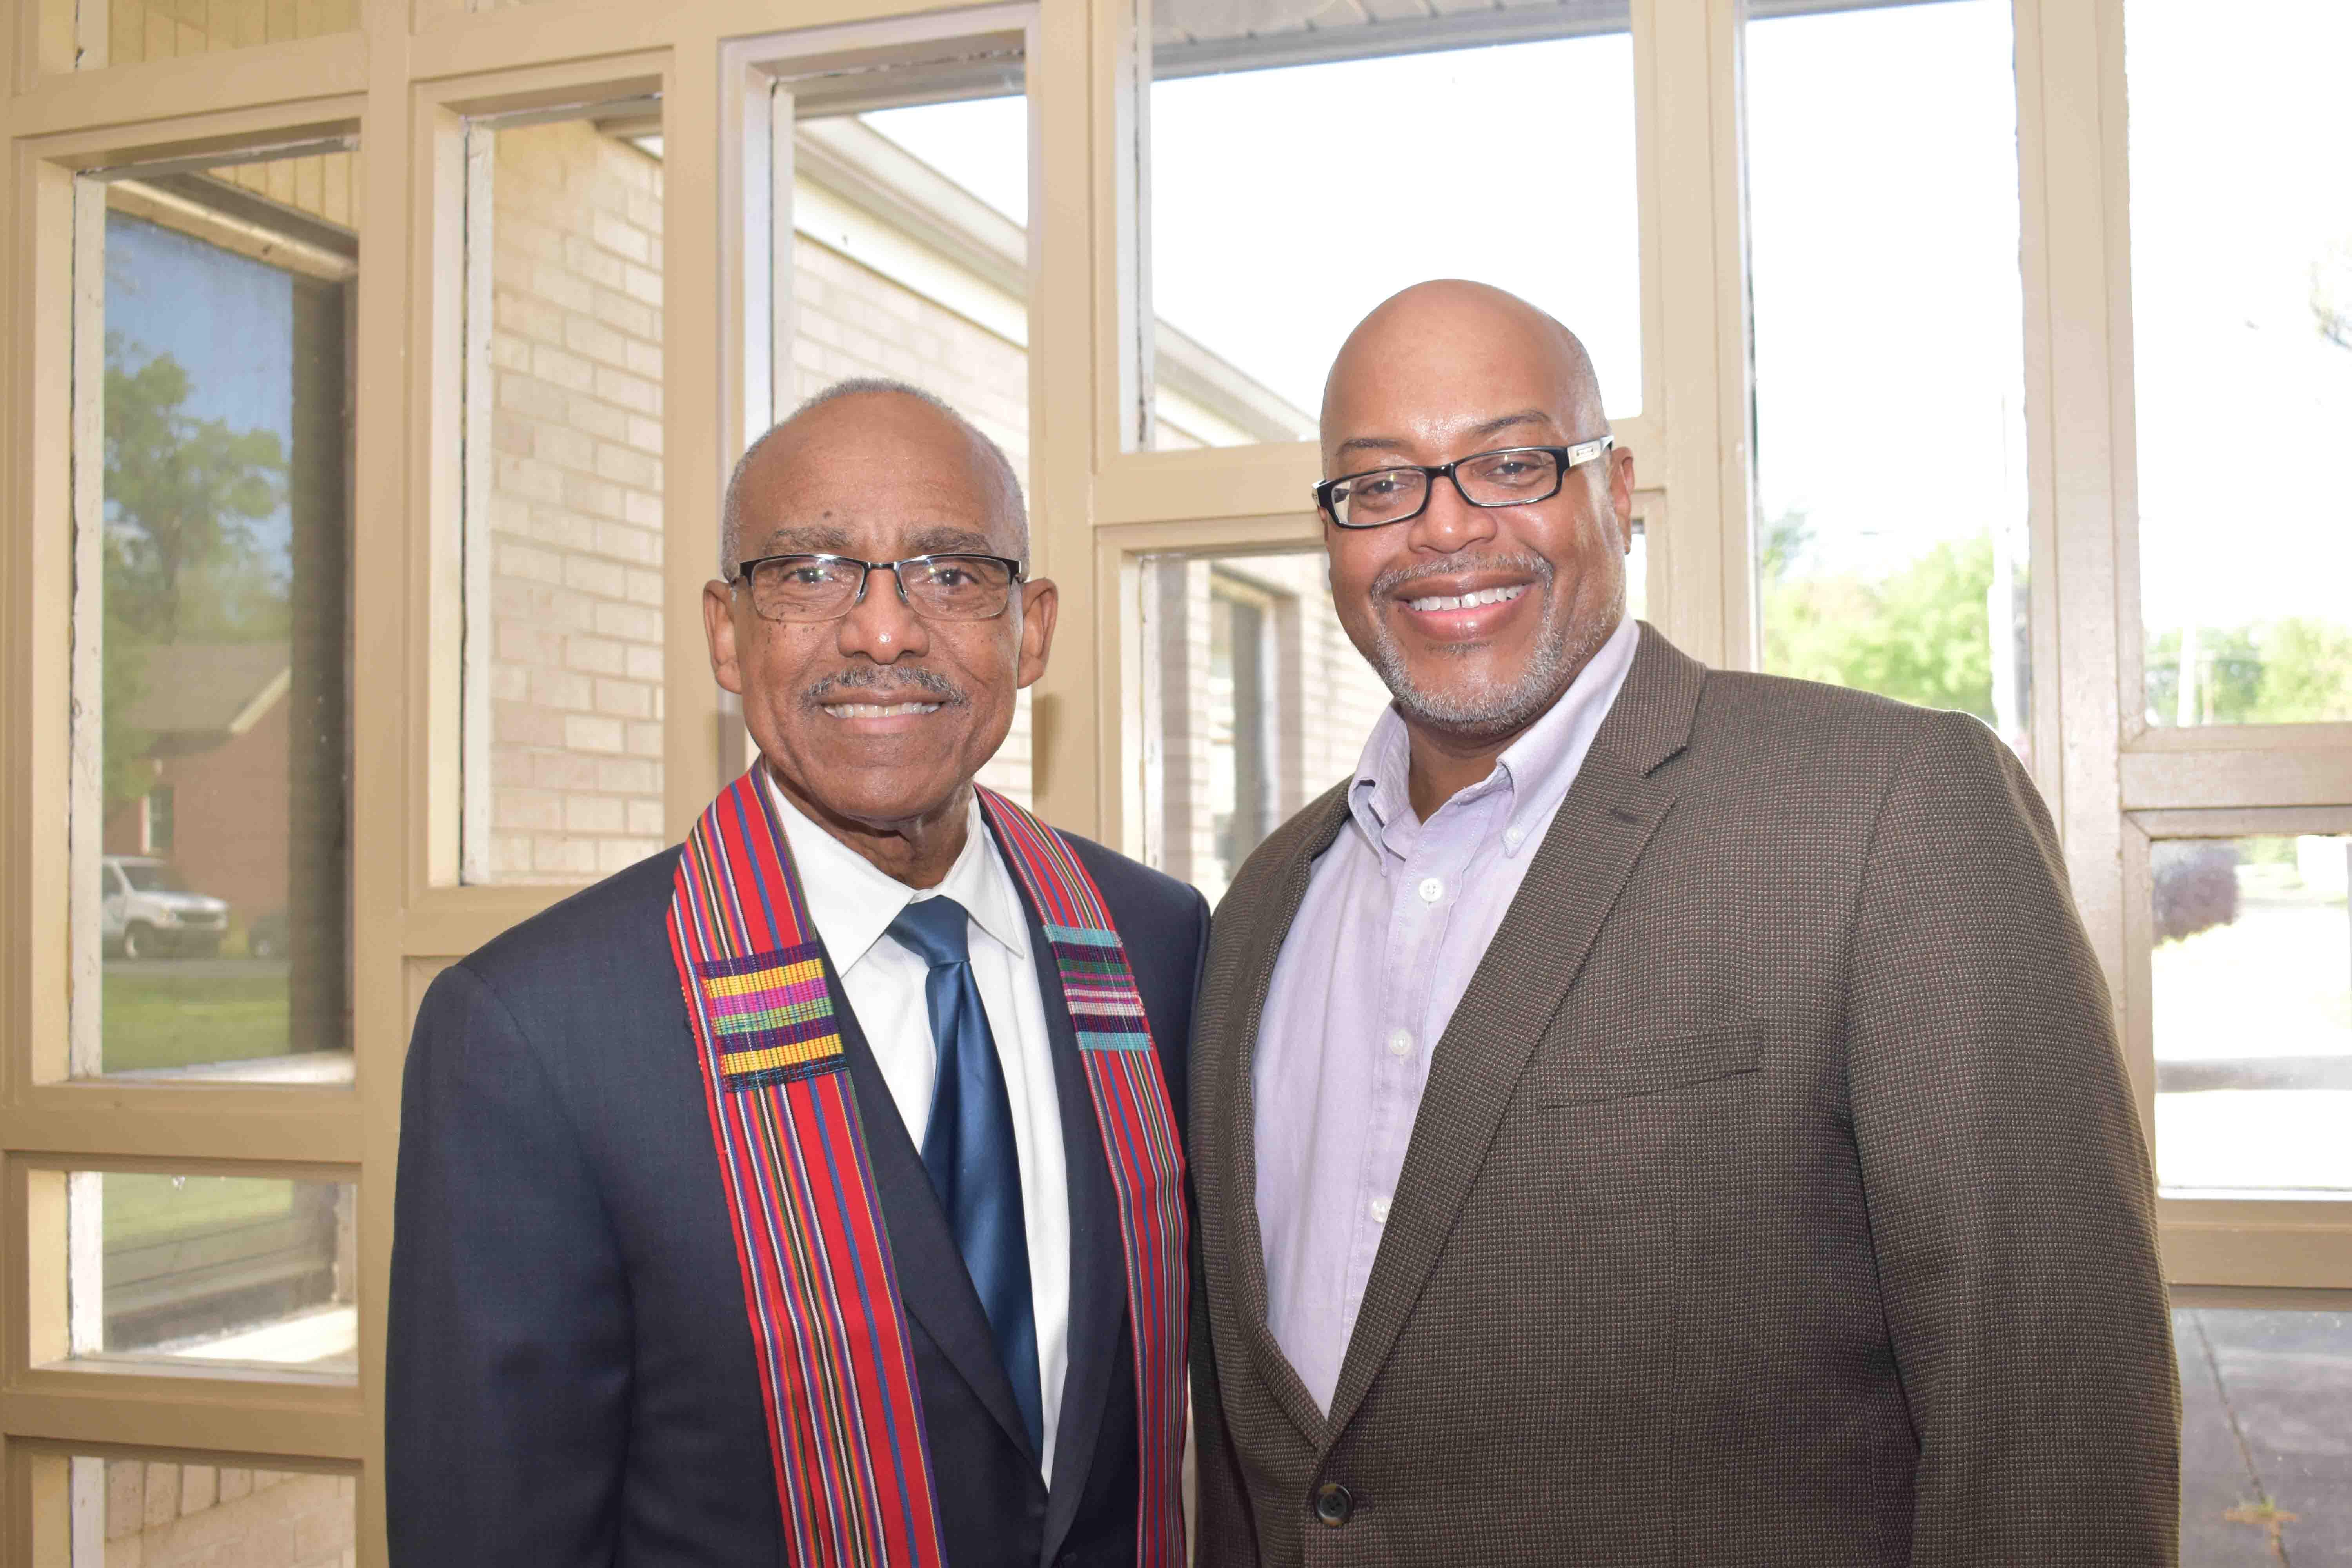 Pastor Truman Tolefree, John Buckman, Jr.